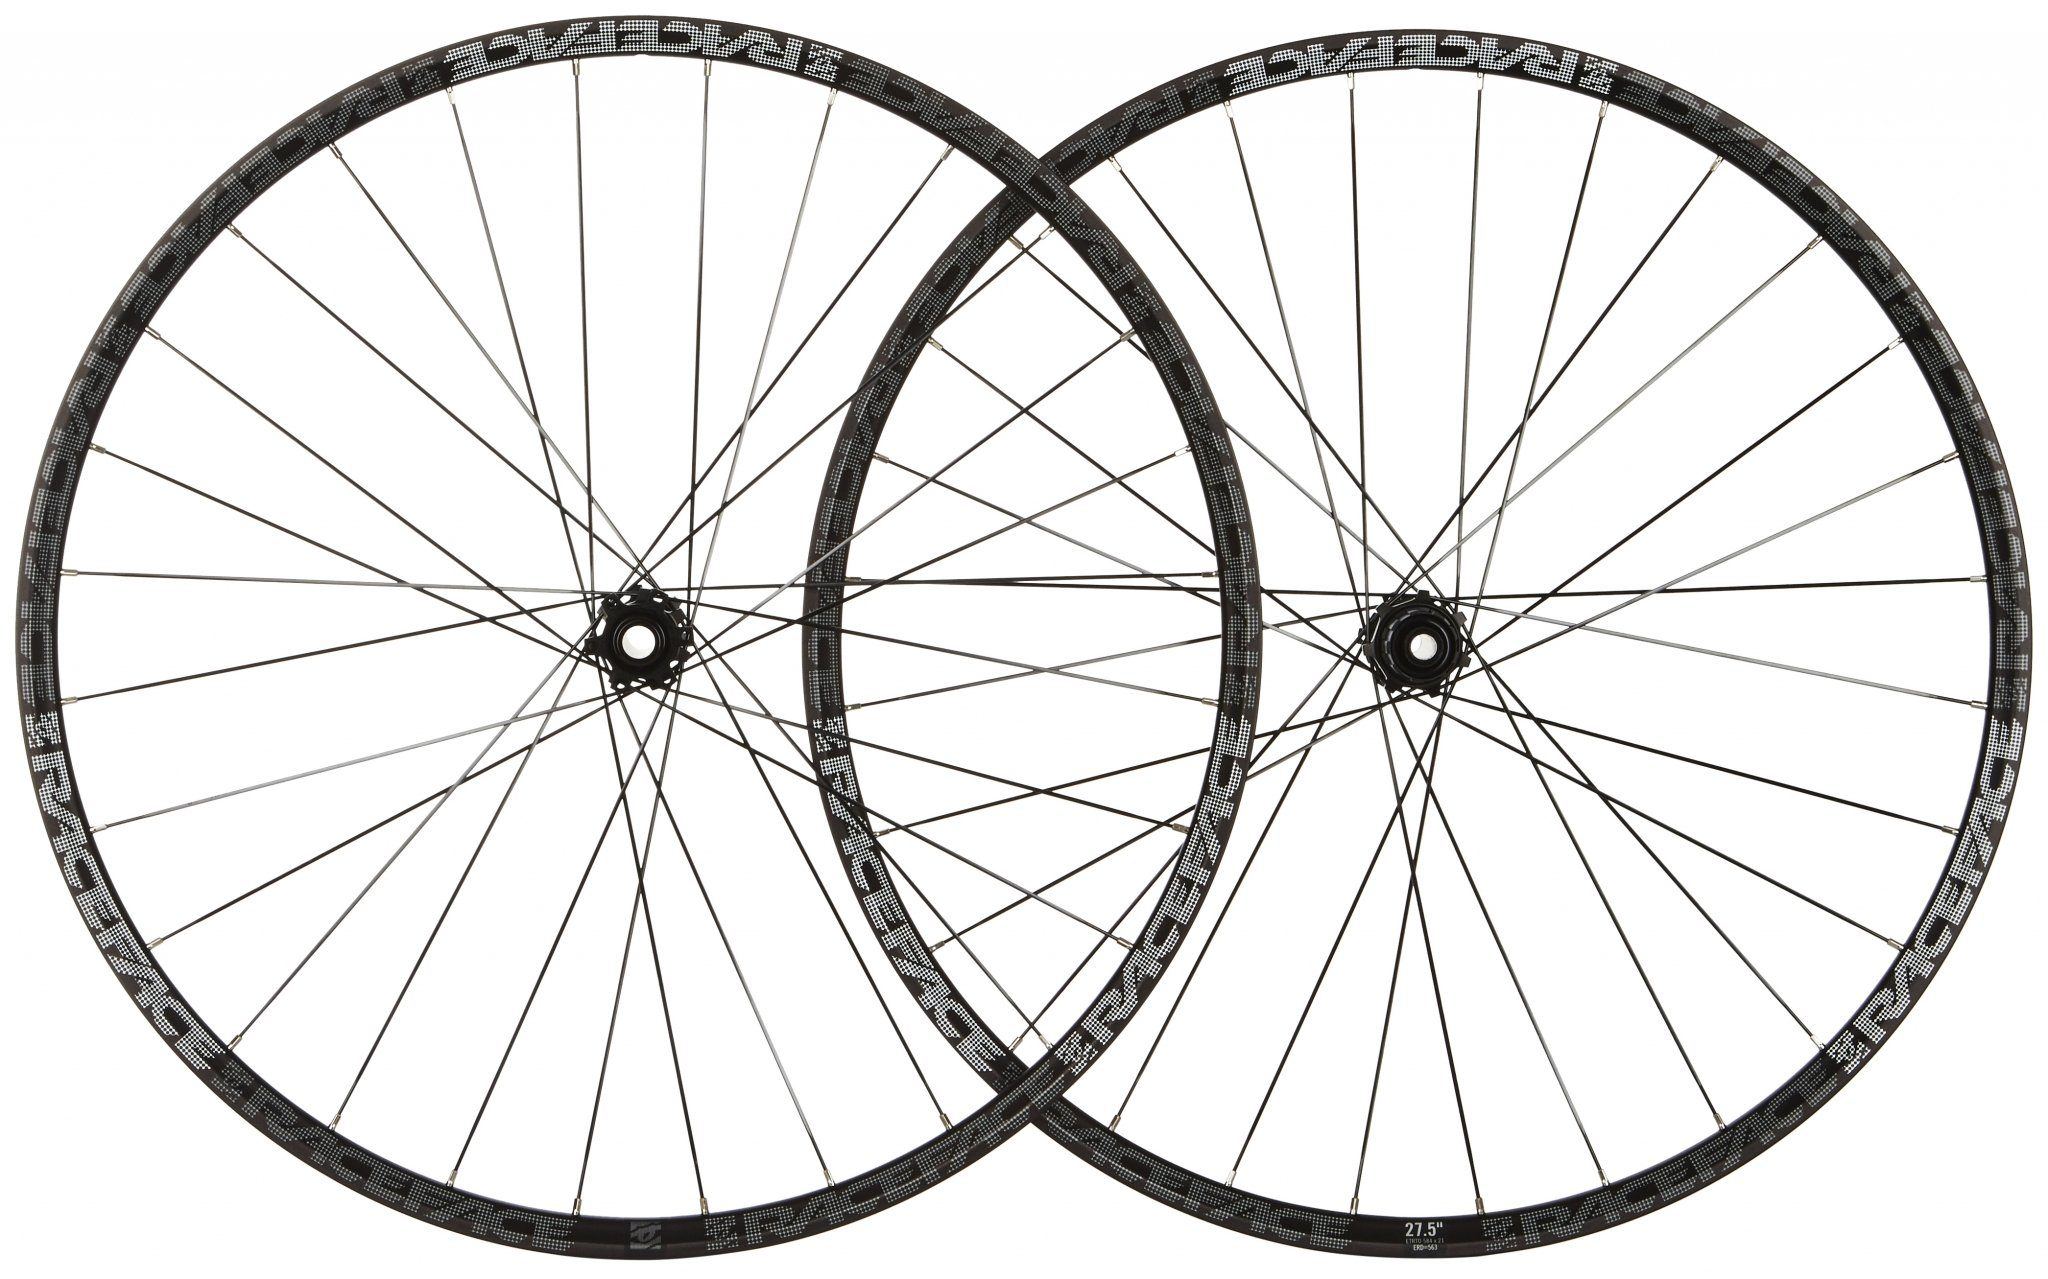 "Race Face Laufrad »Turbine Laufradsatz 27.5"" Shimano schwarz«"